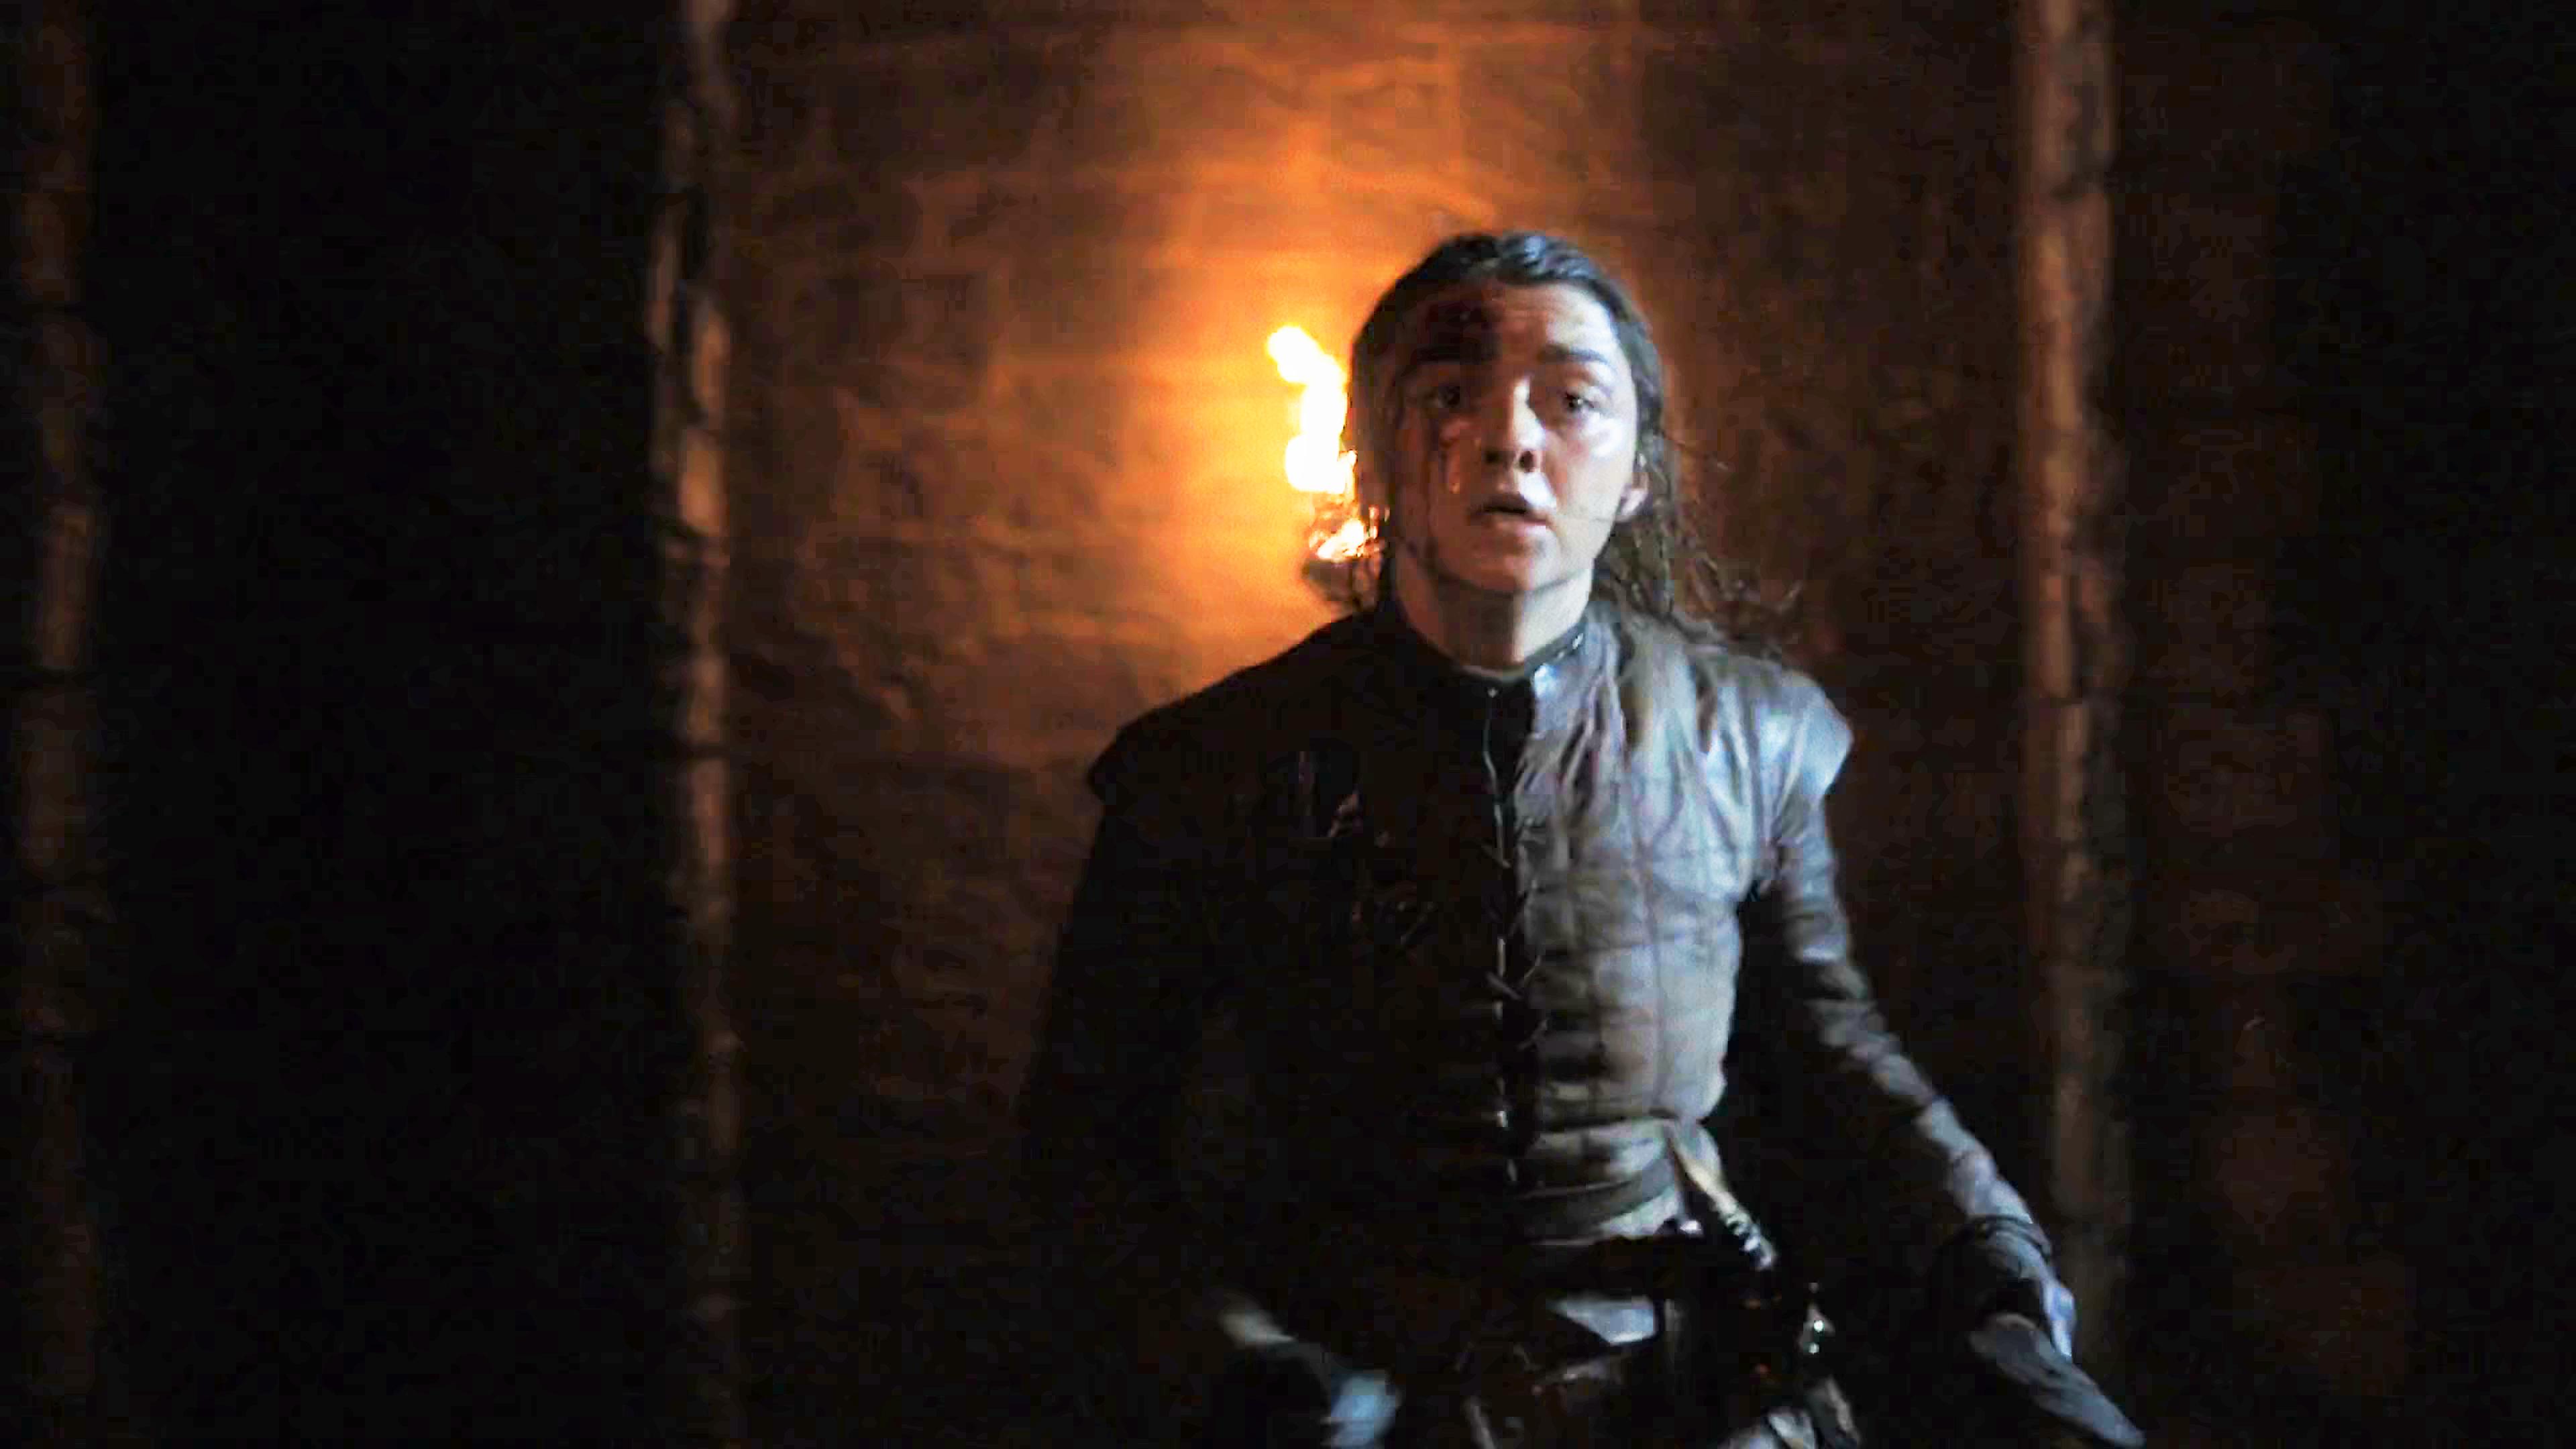 2. Season 8 Trailer Arya Running